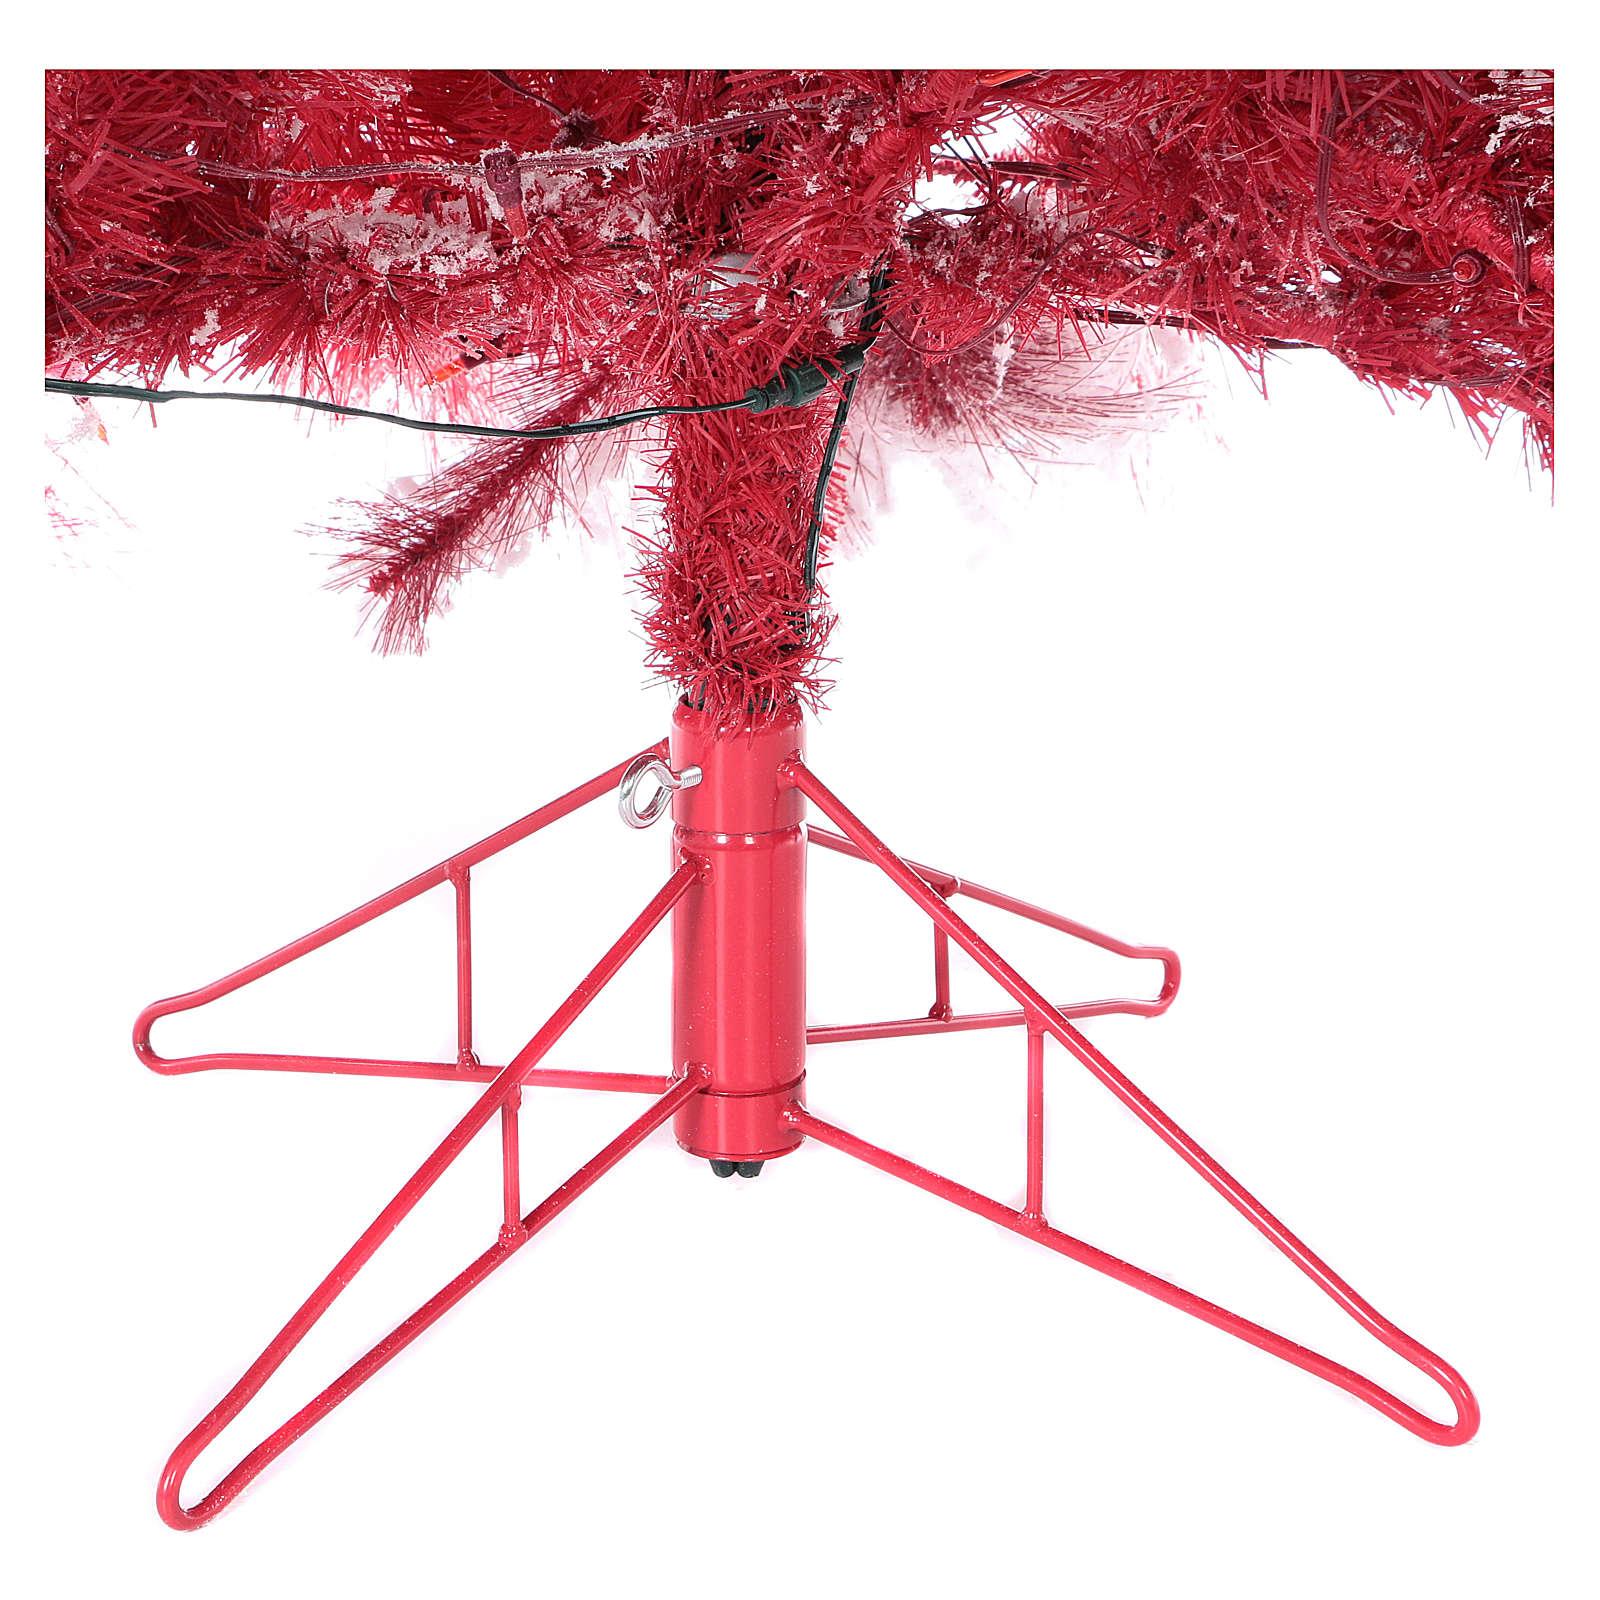 Albero di Natale 270 cm Red Velvet abete innevato 700 luci led interno 3